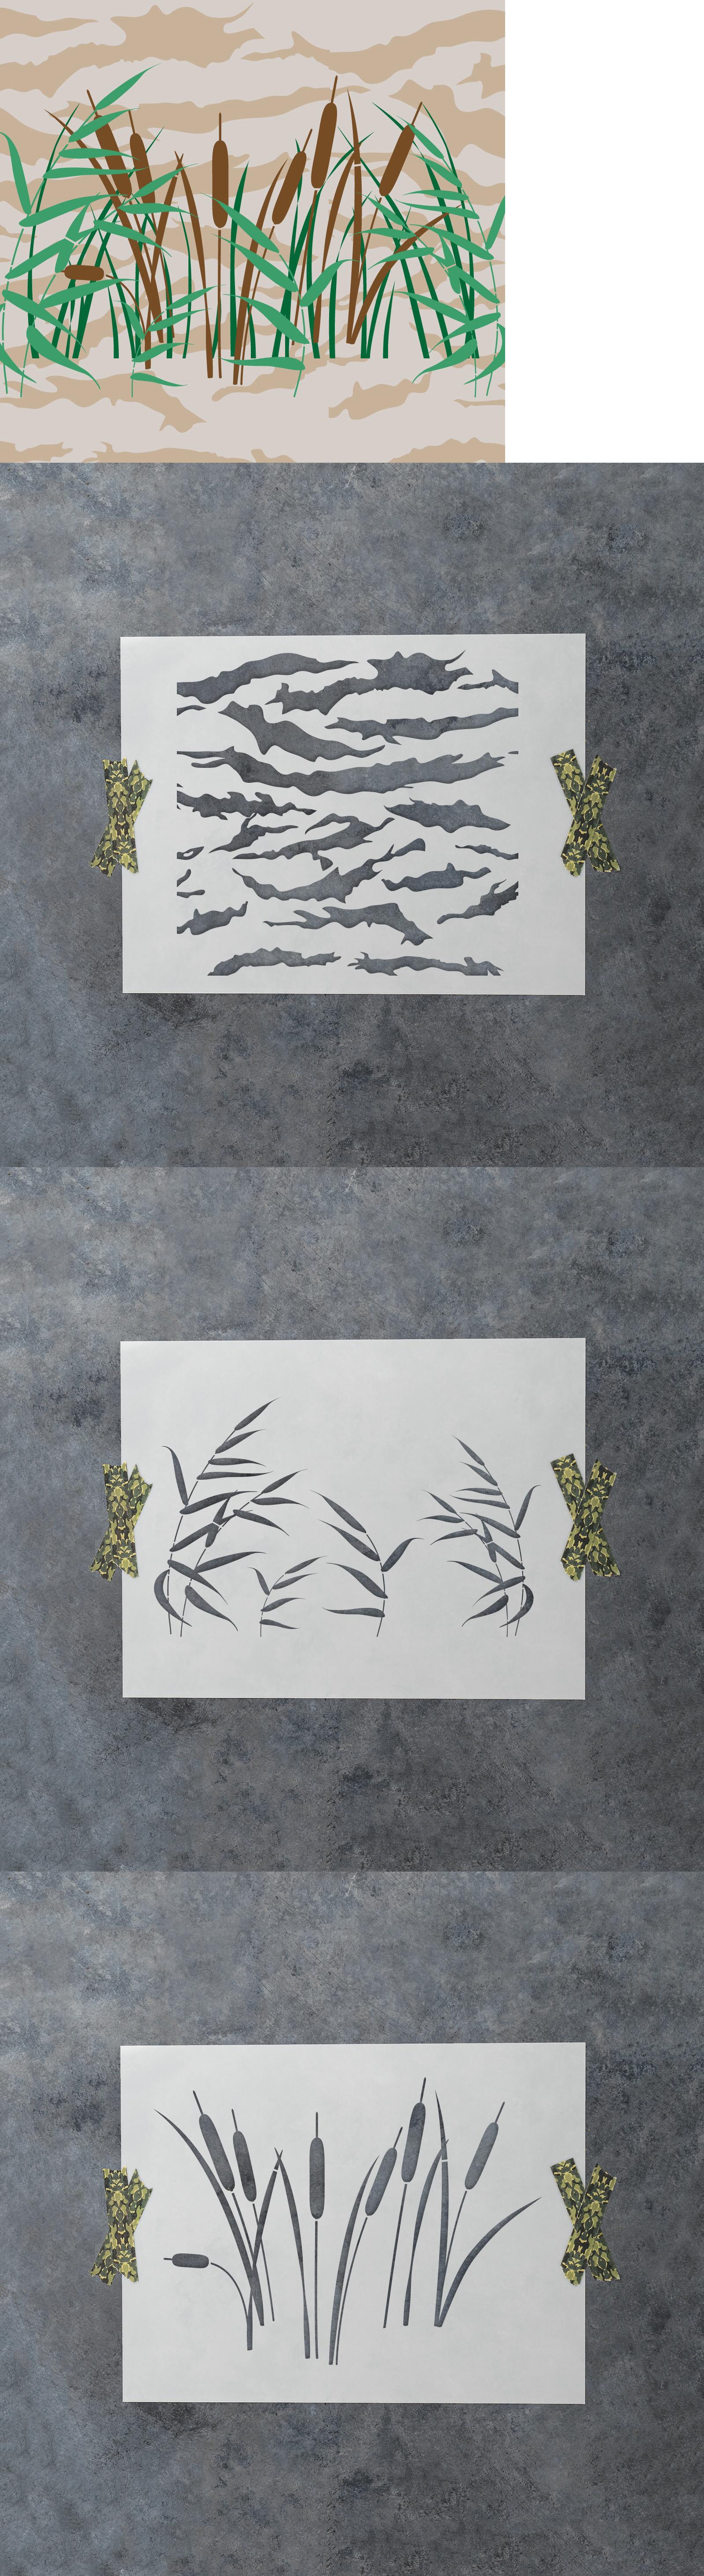 Stencils and Templates 183185: Camo Stencil - Reusable 4-Piece ...